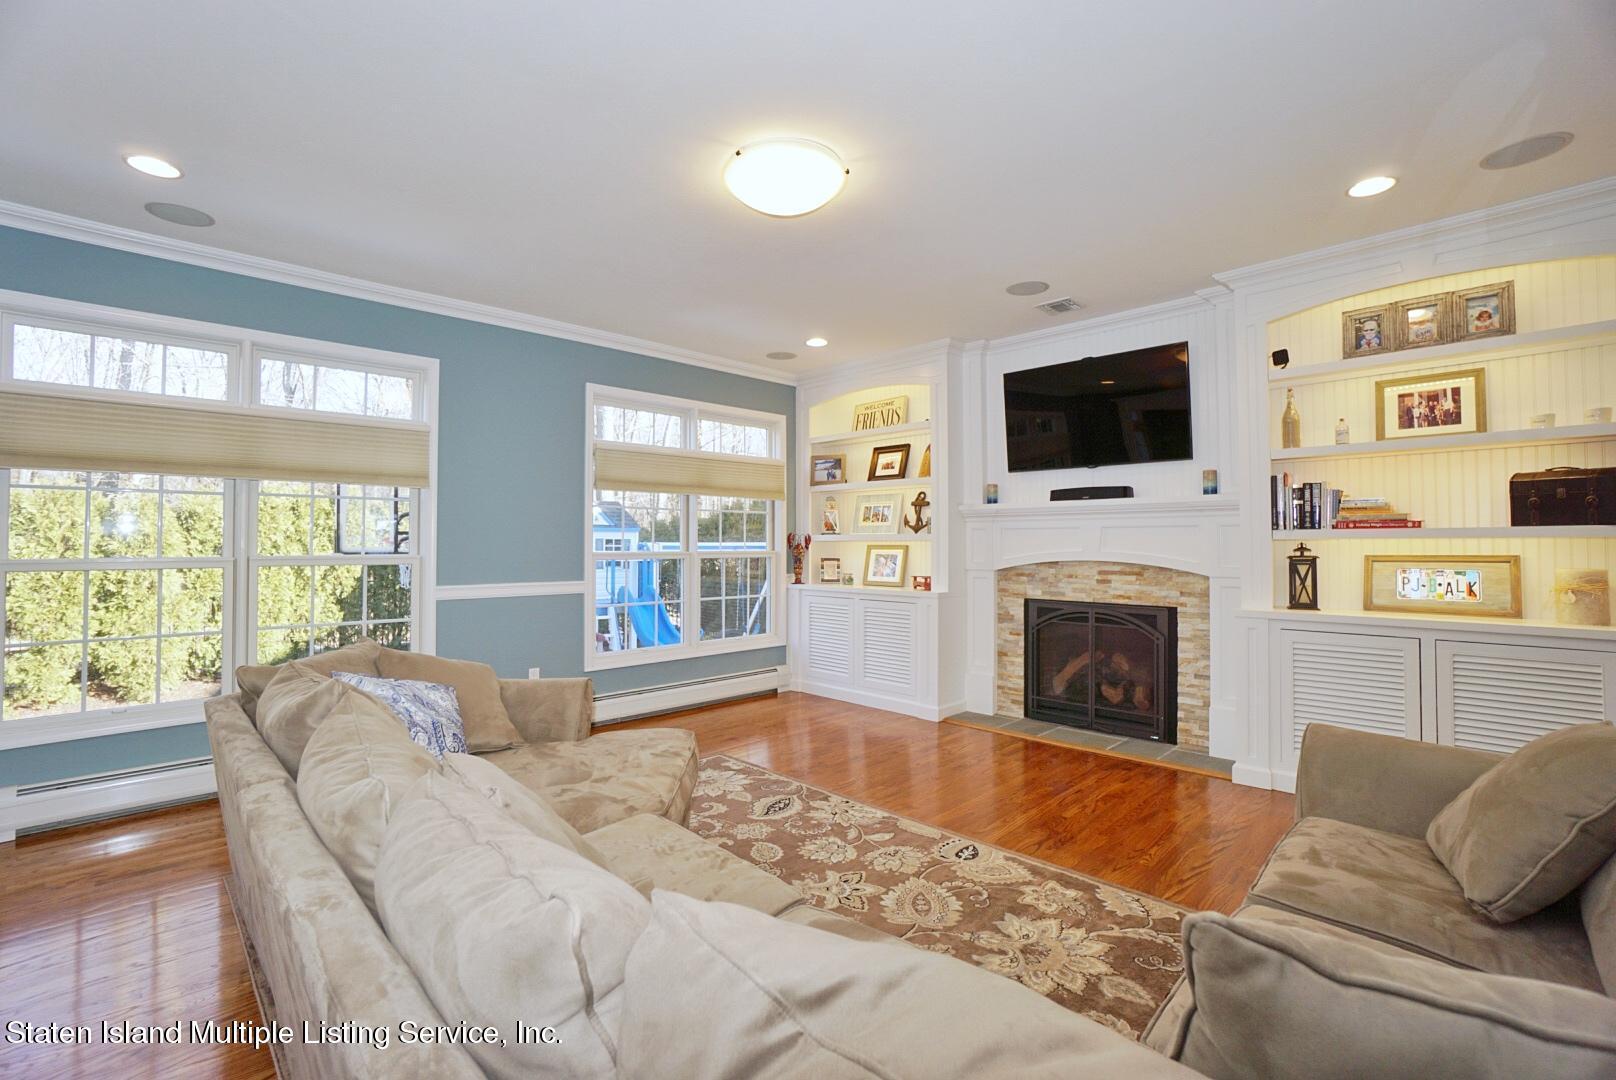 Single Family - Detached 31 Belwood Loop  Staten Island, NY 10307, MLS-1143133-16